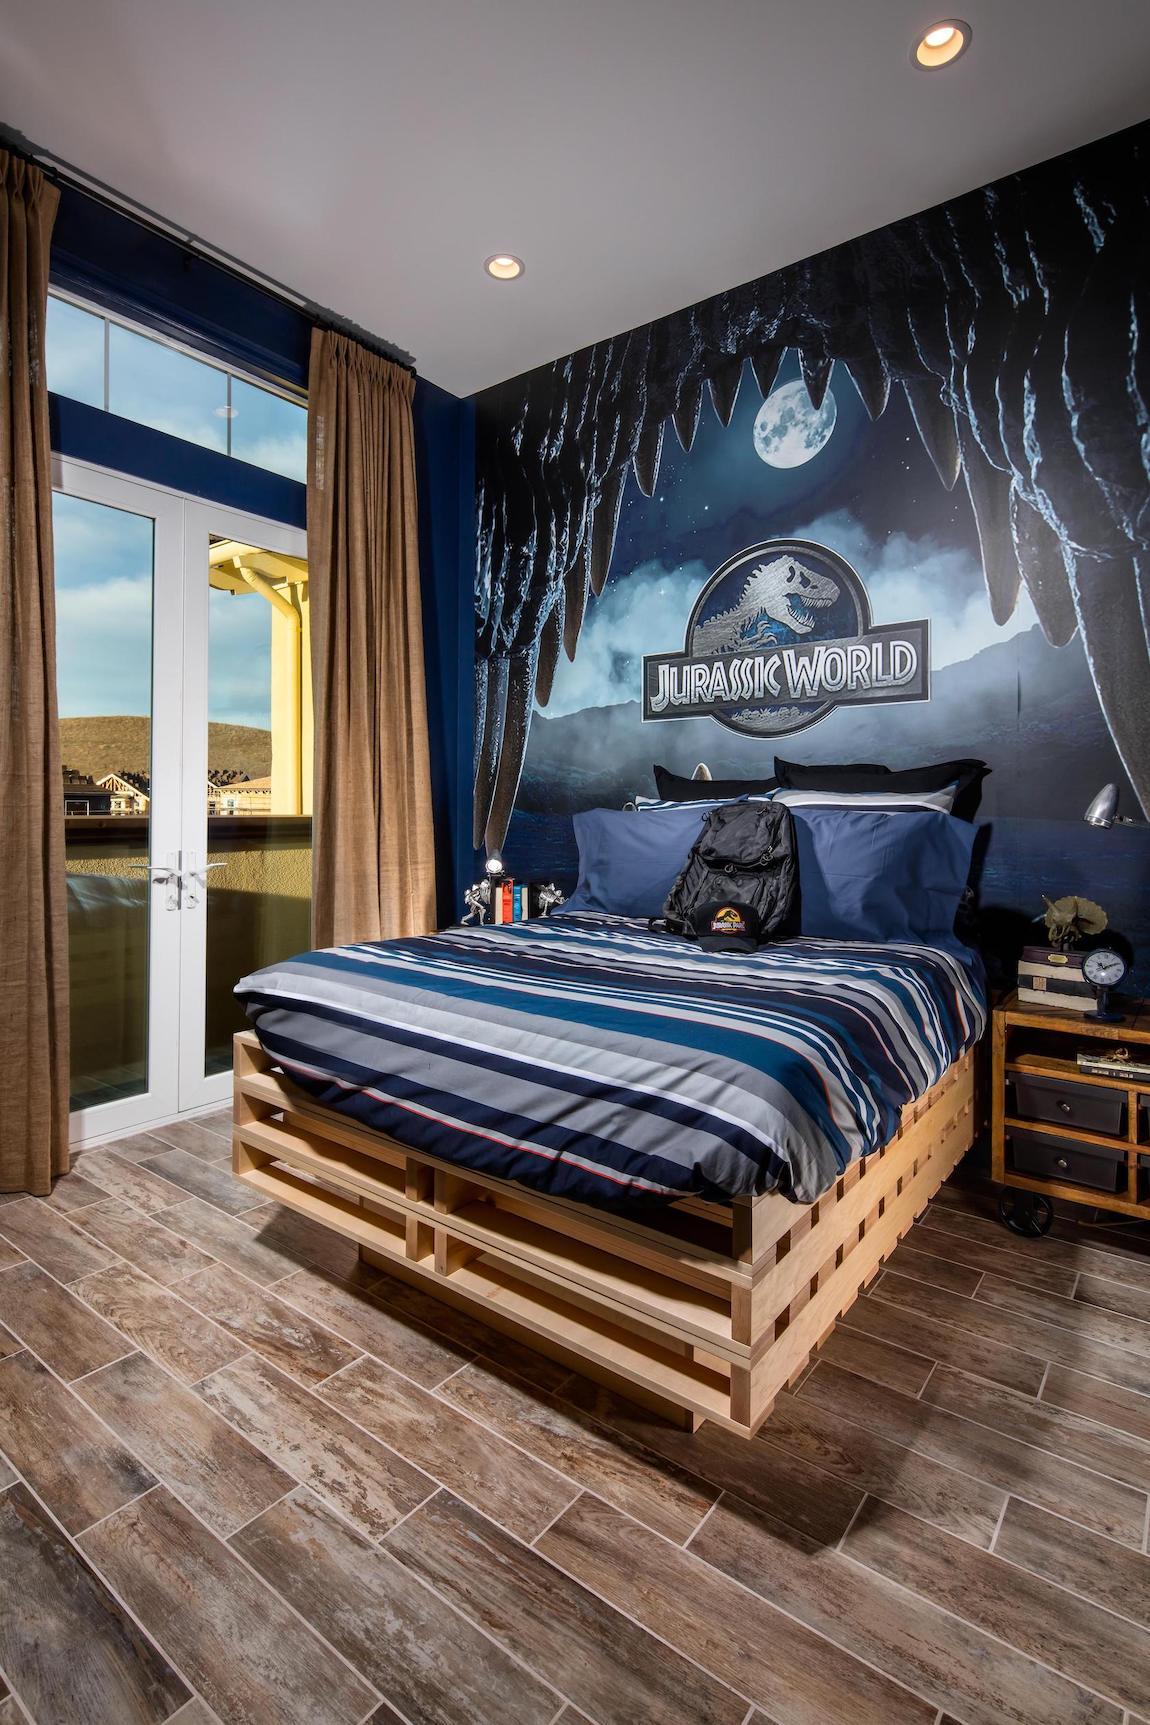 Jurassic World decorated kid's room